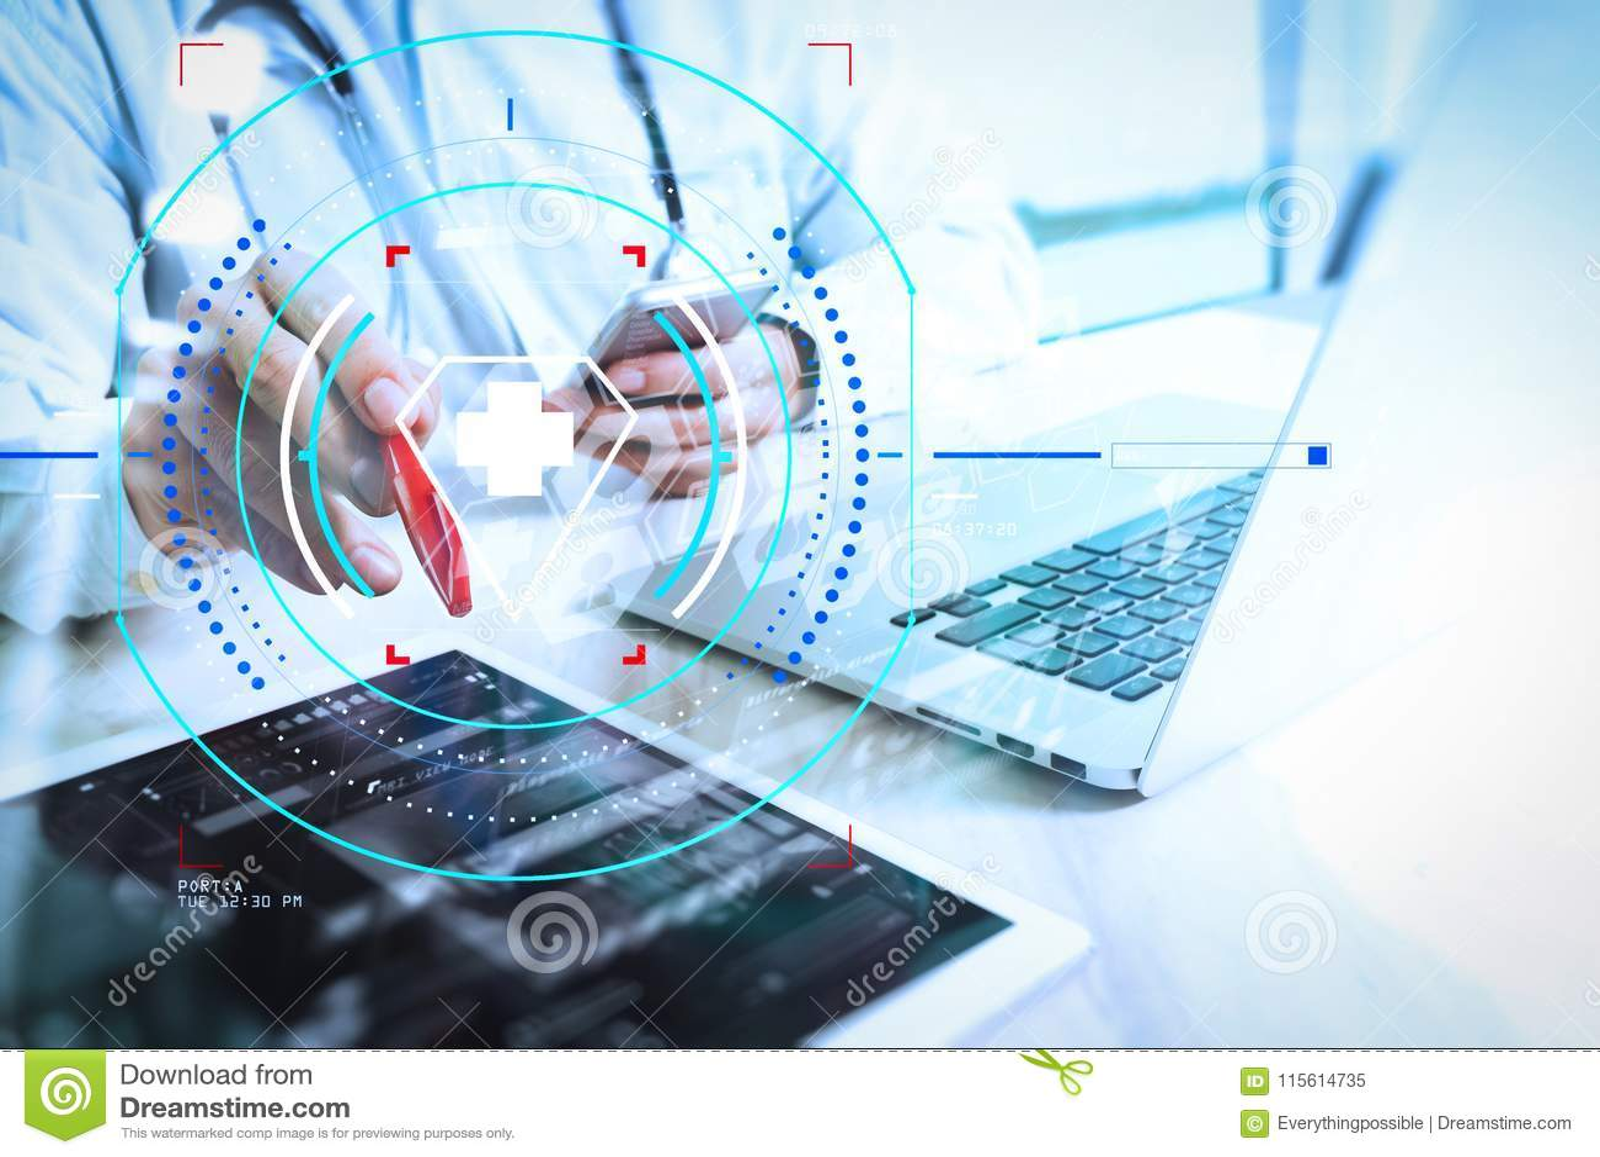 health care medical services circular ar diagram medical technology concept doctor hand working modern digital 115614735 medical technology concept doctor hand working with modern digi